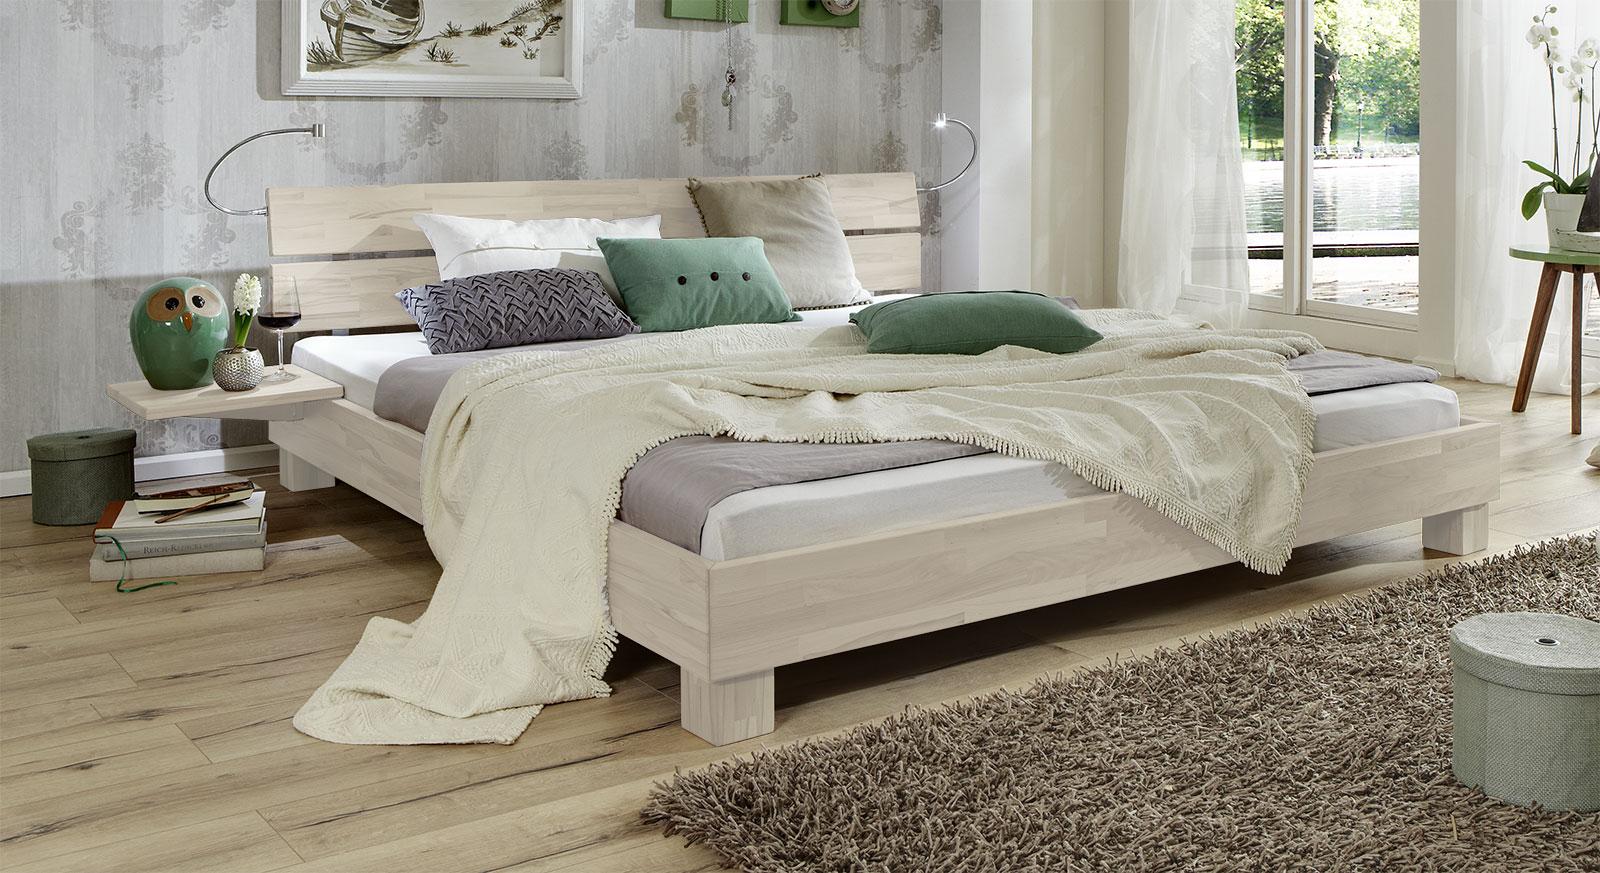 Bett Mera aus Massivholz in Buche weiss